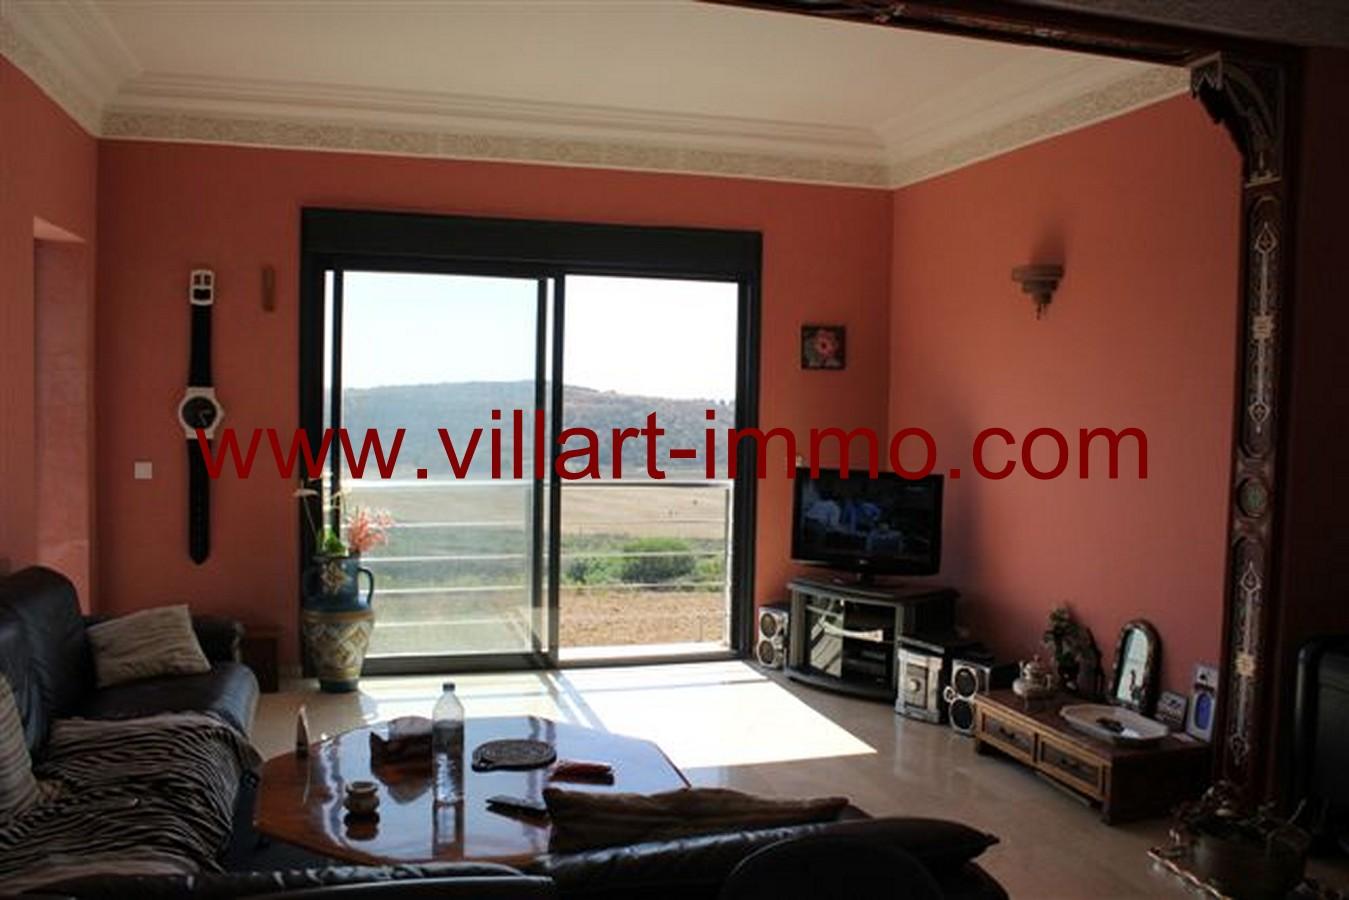 2-Vente-Appartement-Assilah-Autres-Salon 1-VA49-Villart Immo